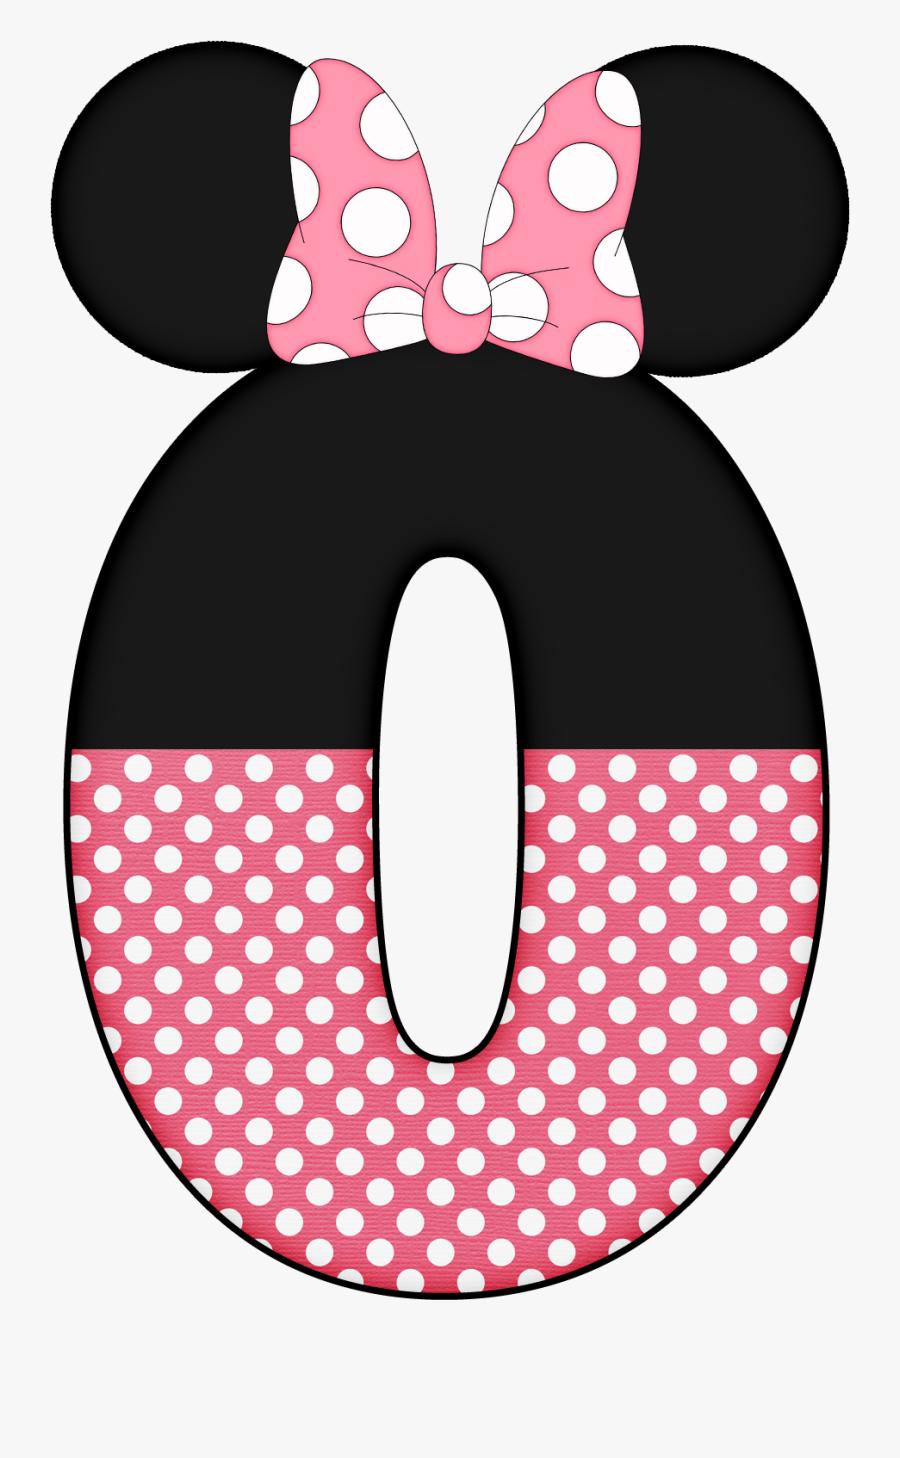 Transparent Baby Minnie Mouse Png - 3 Minnie Mouse Png, Transparent Clipart